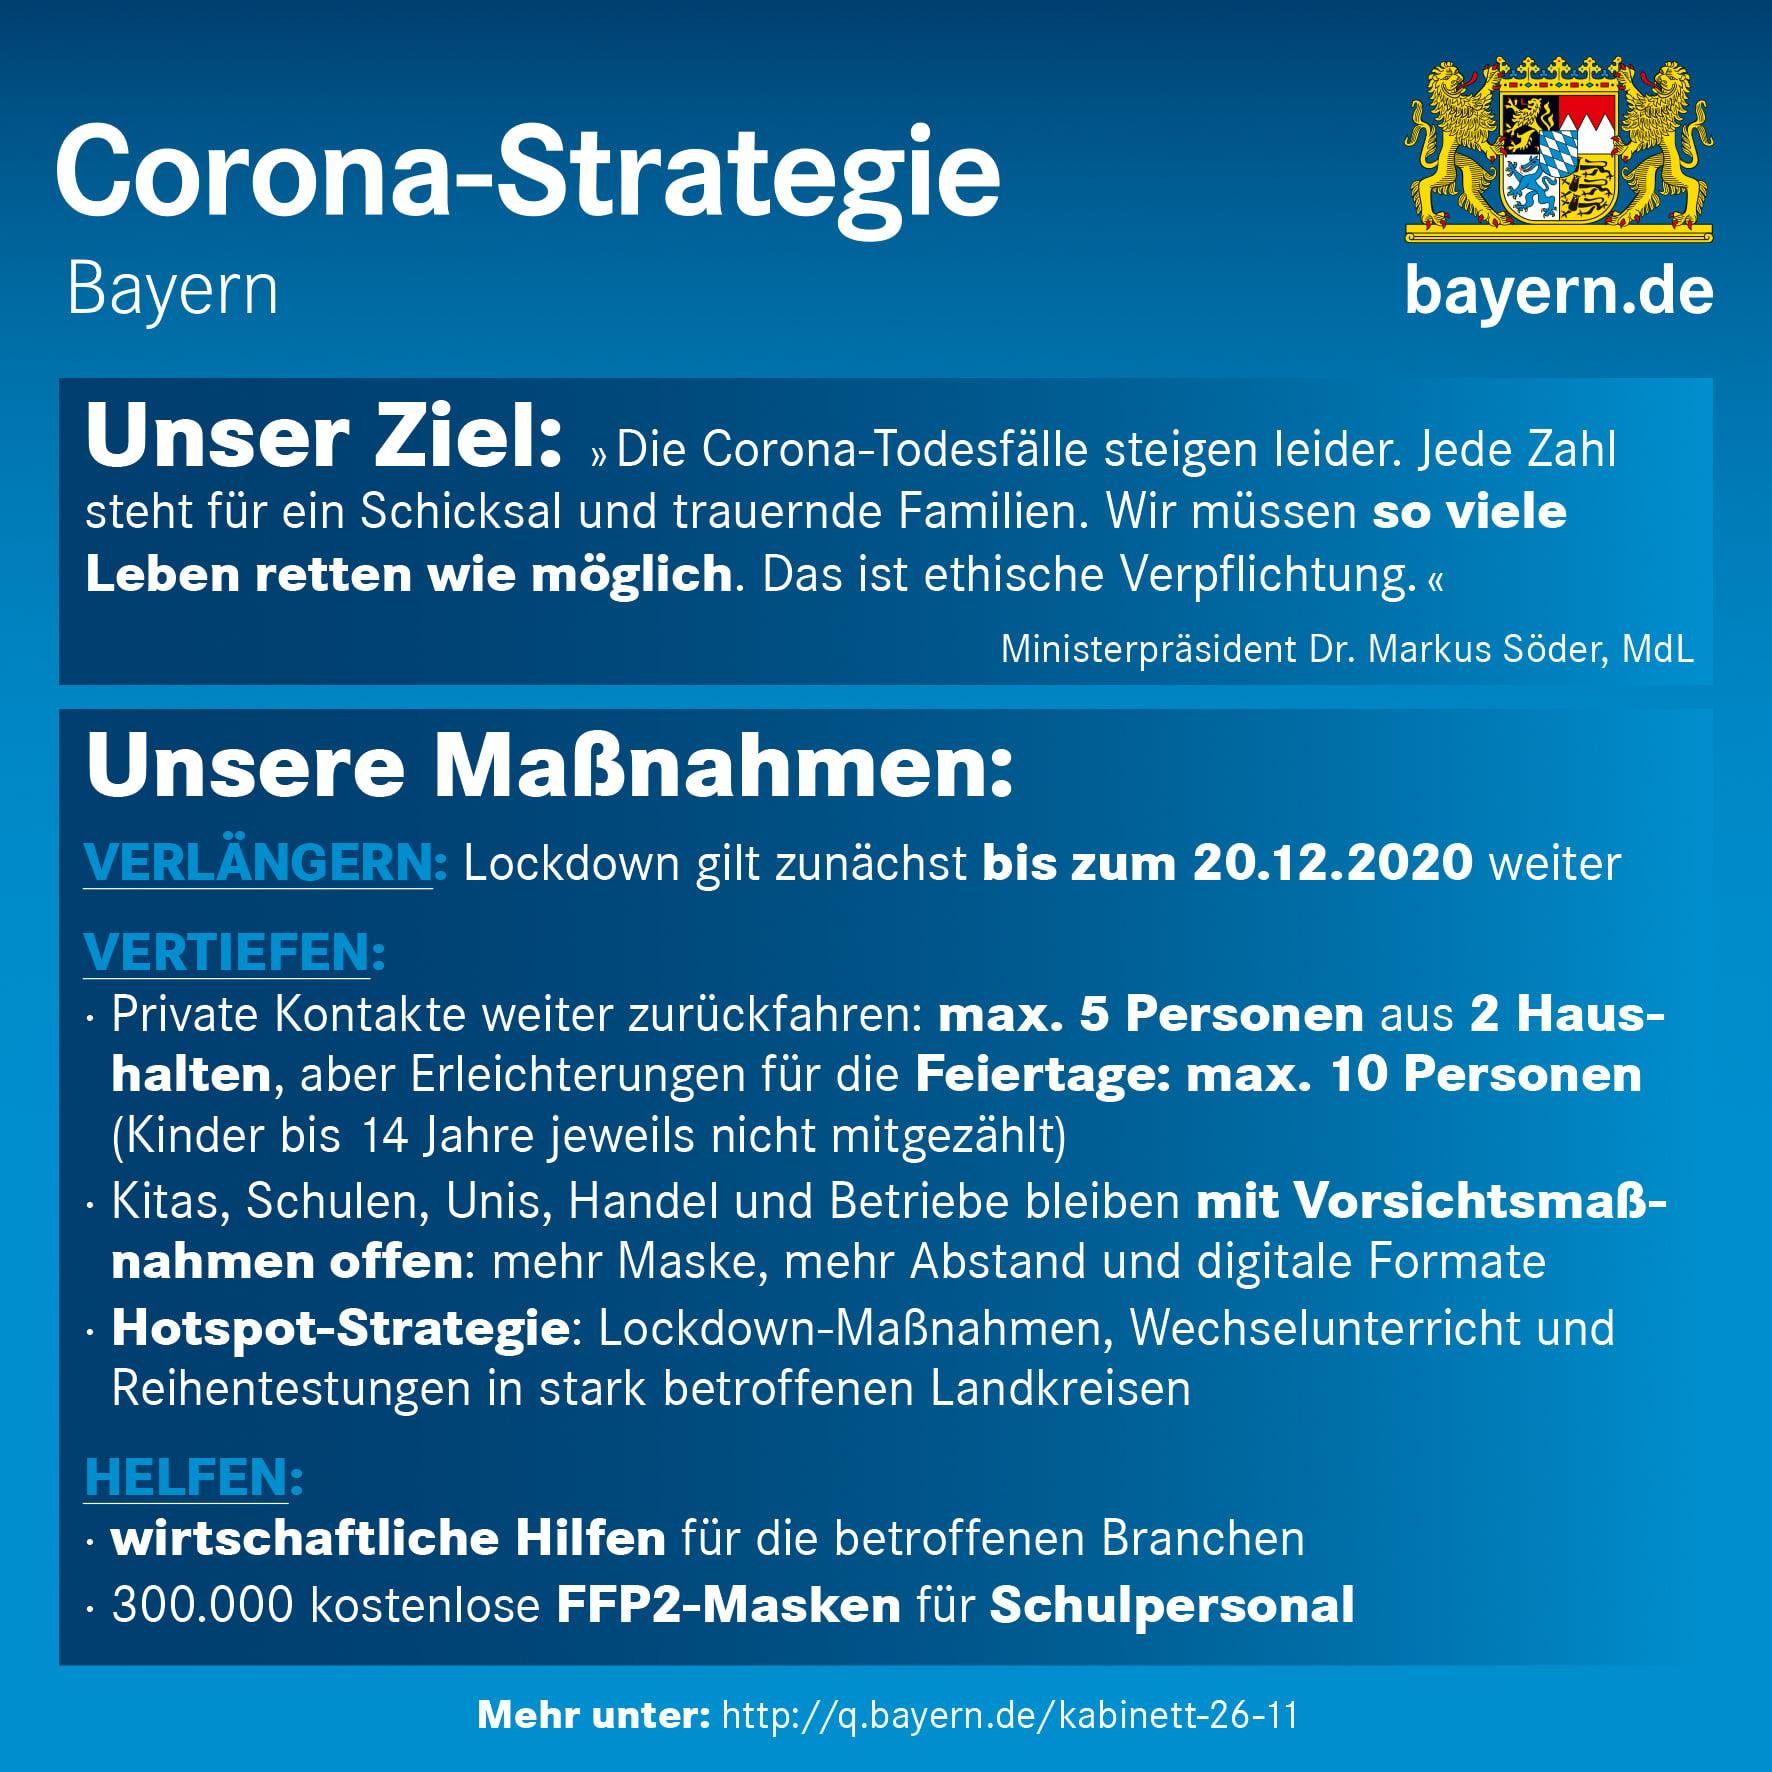 Corona-Strategie Bayern November 2020